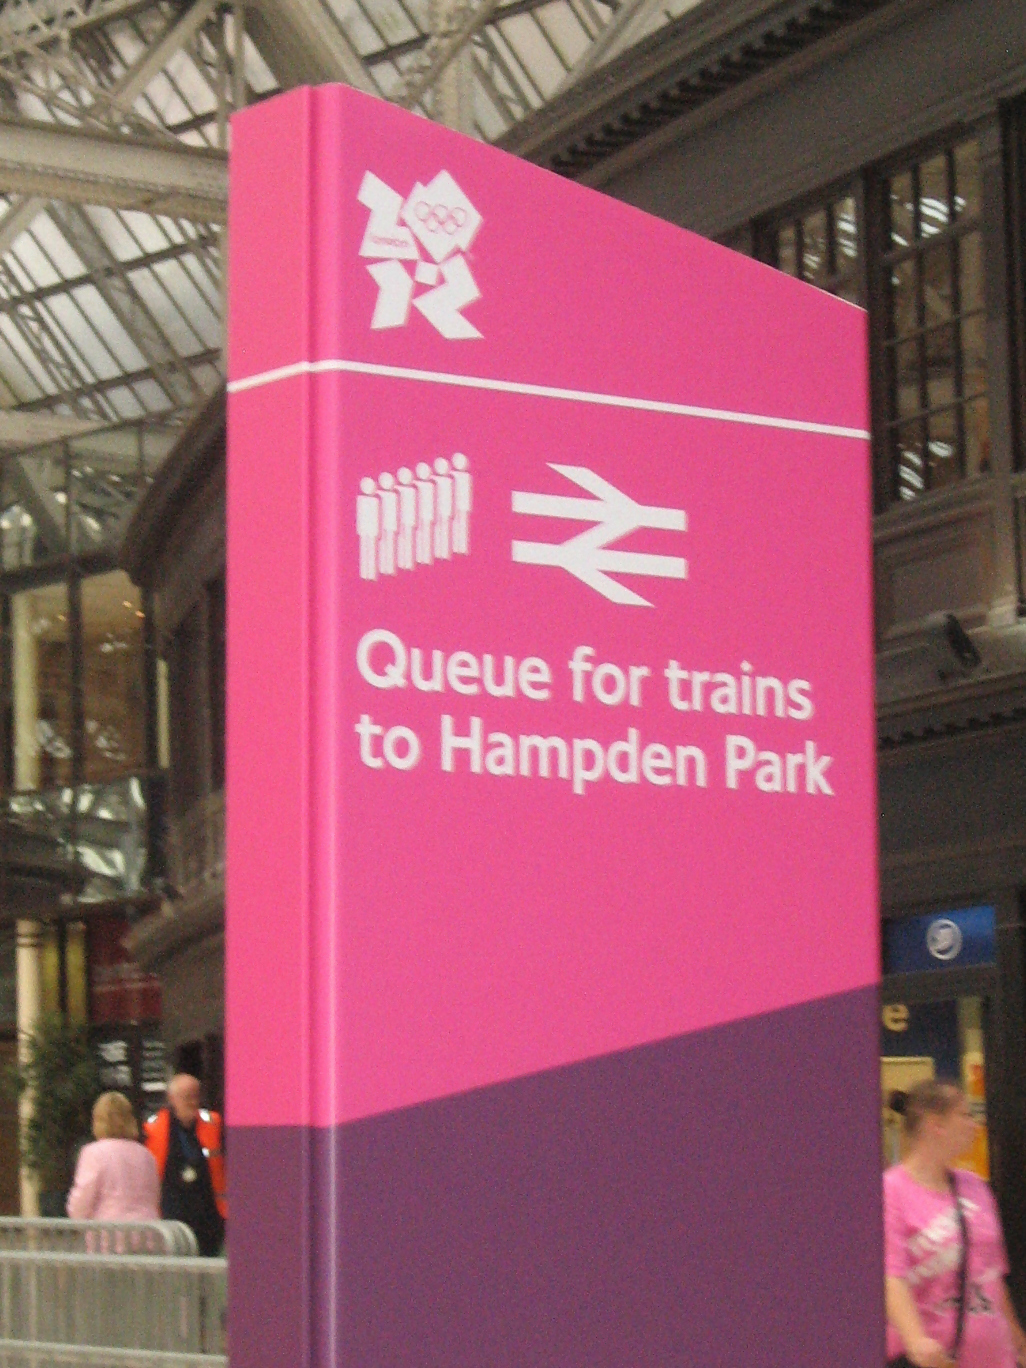 london 2012 signage at glasgow central.jpg